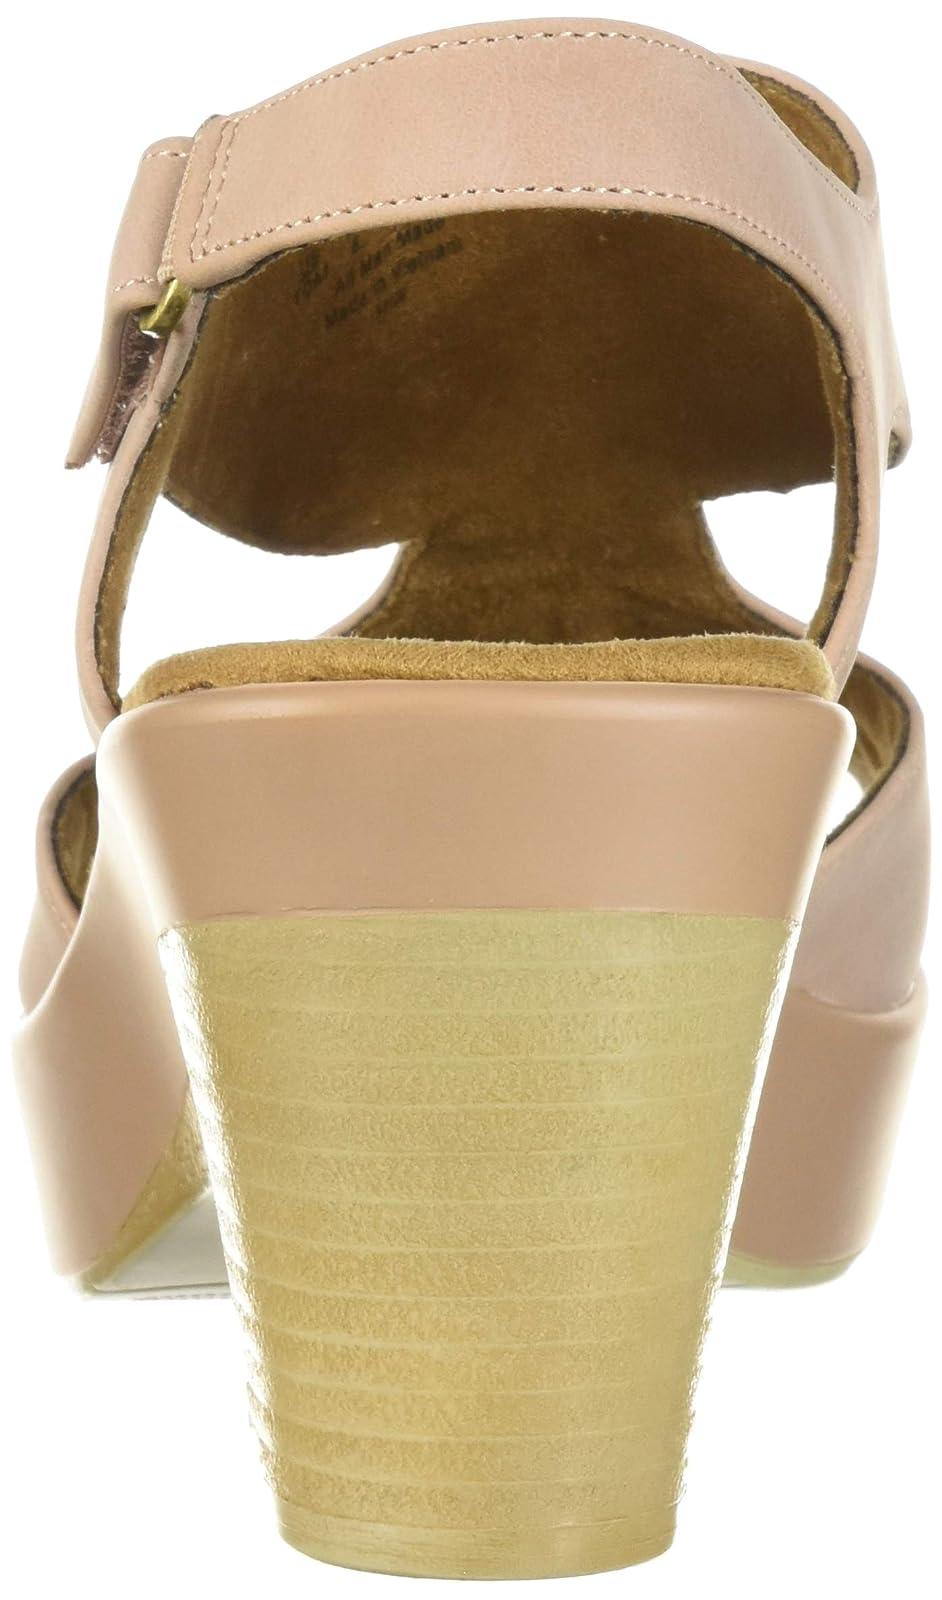 Natural Soul Women's Mia Heeled Sandal F4845S0 - 2